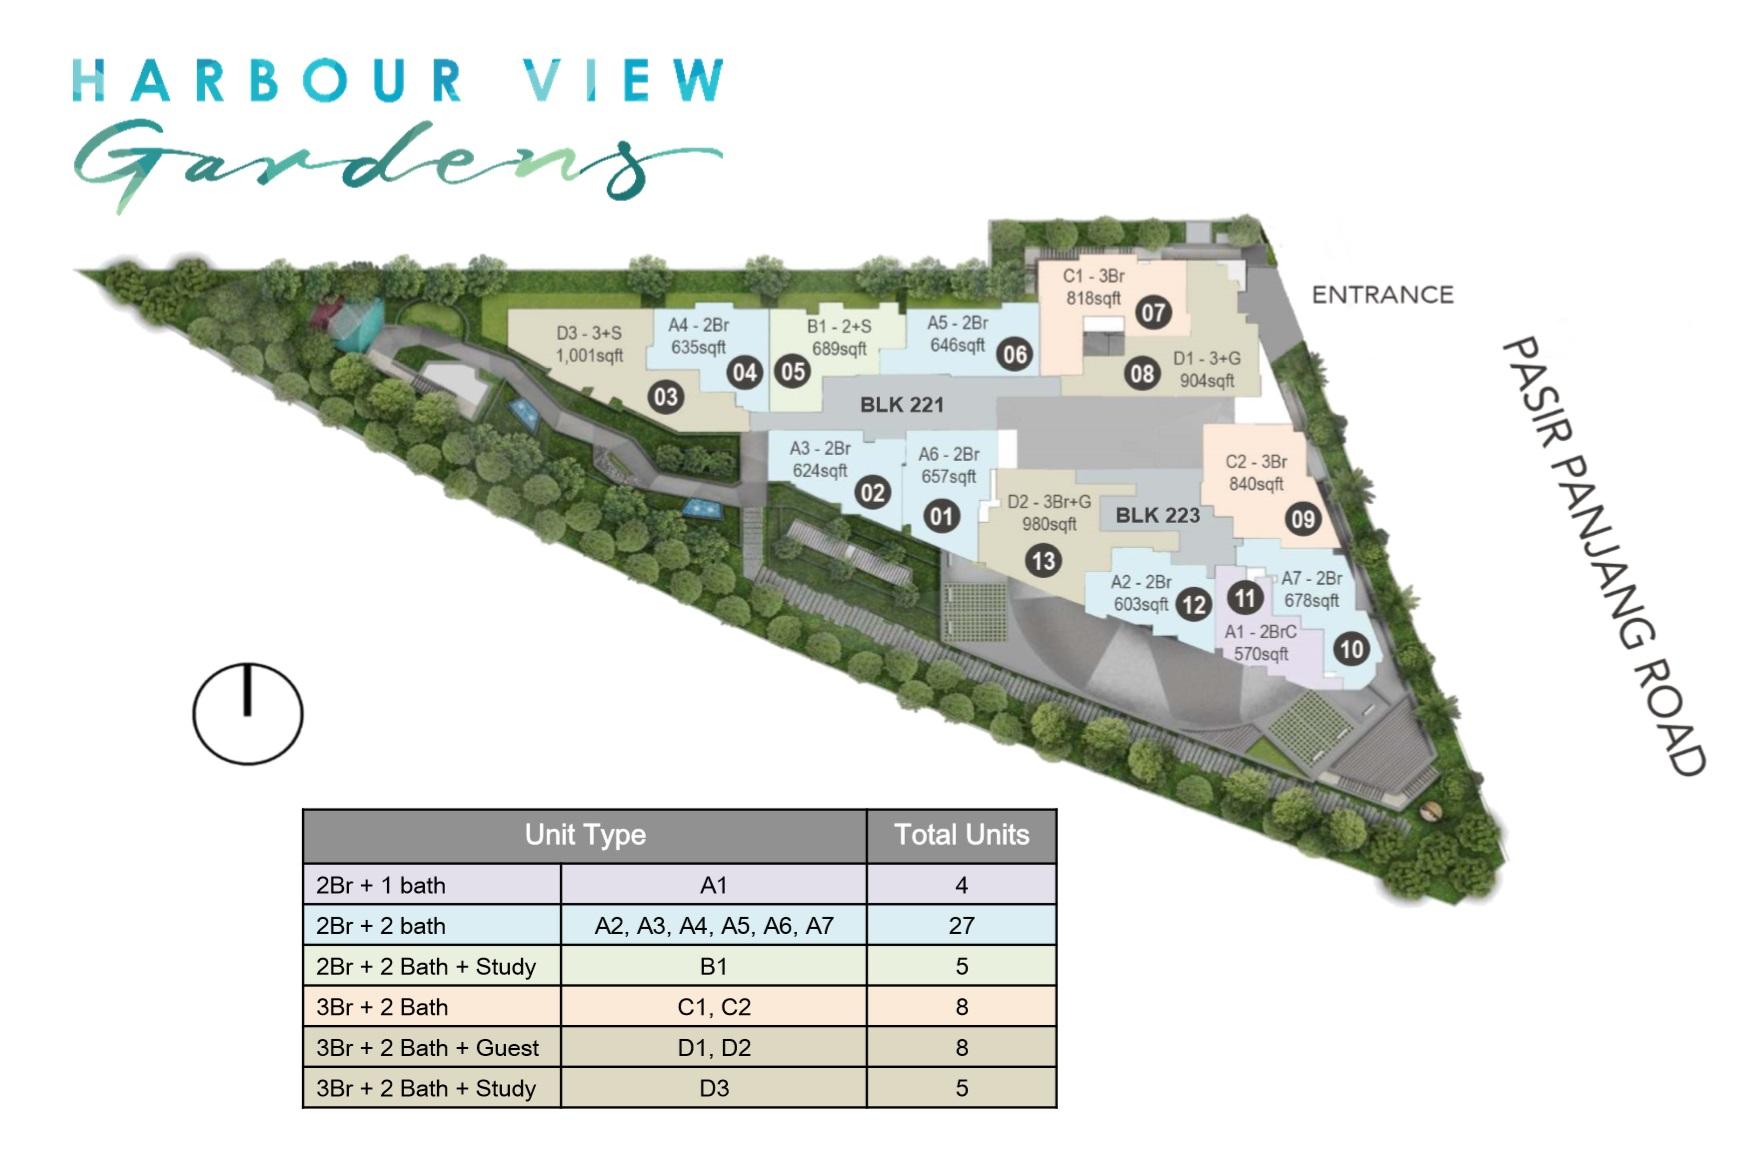 Harbour Views Gardens Siteplan